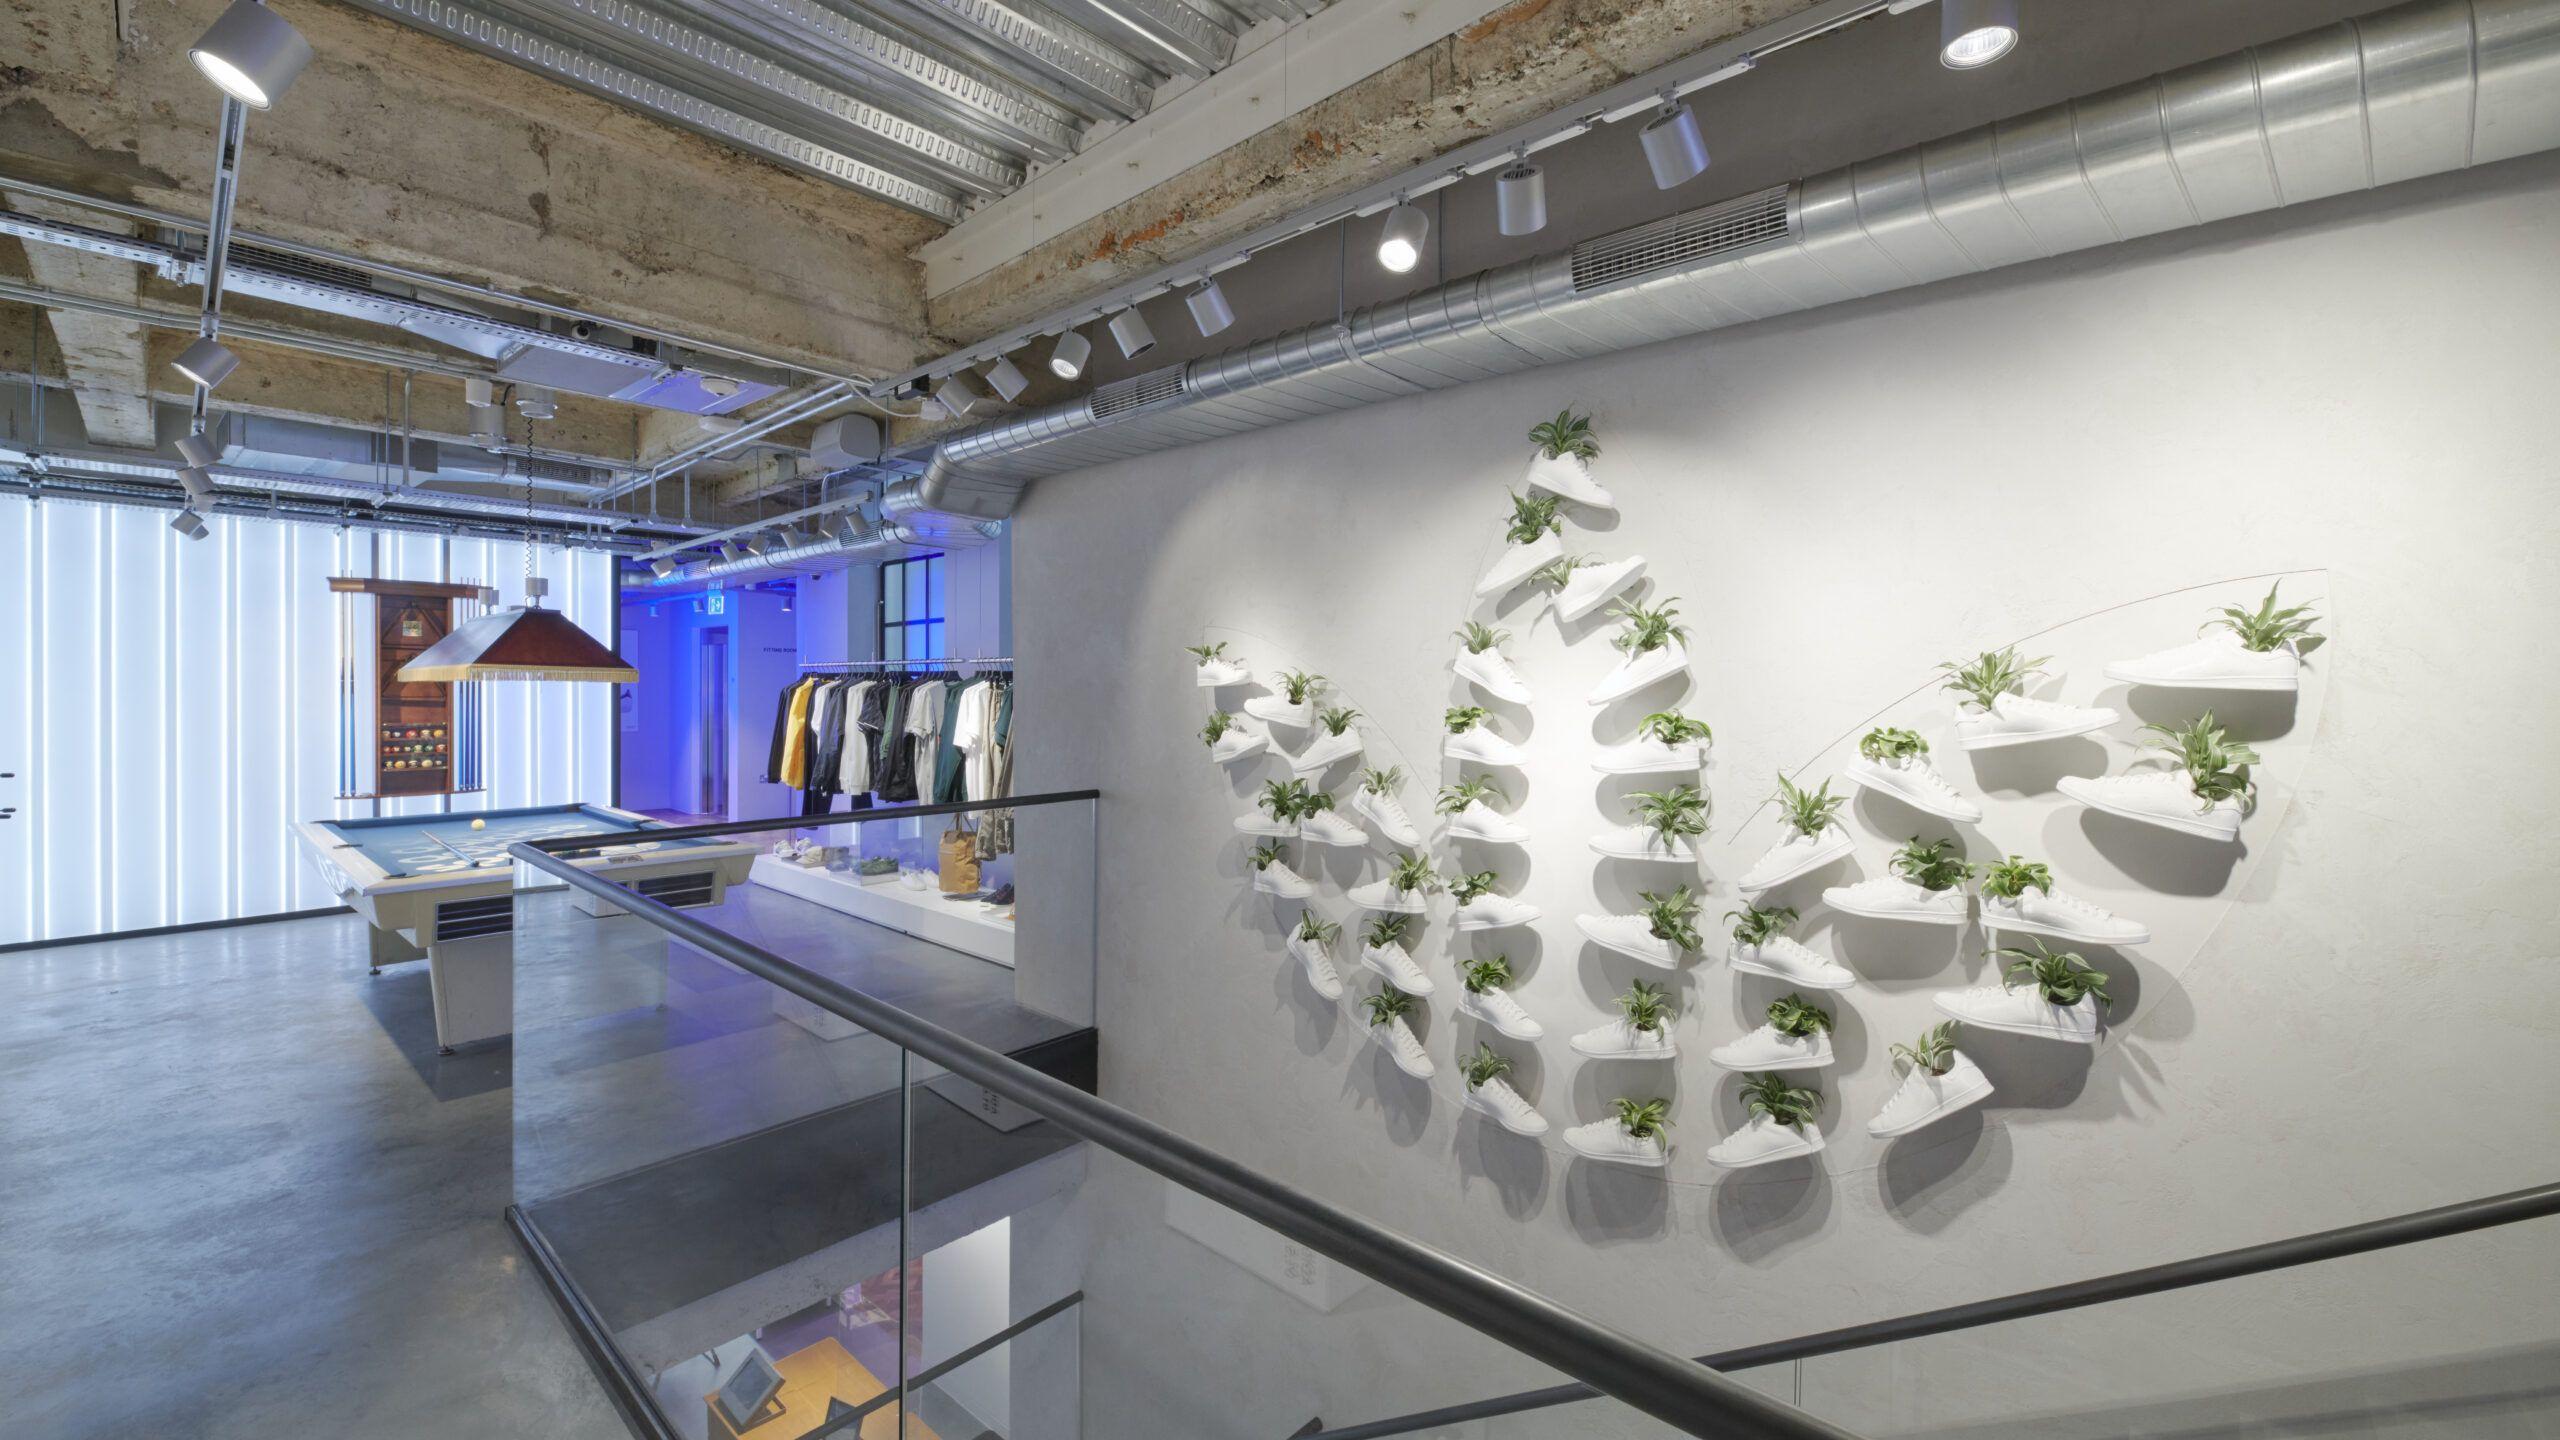 ladrar calificación invadir  adidas opens a new adidas Originals flagship store on Carnaby Street - |  Interior design jobs, Adidas originals, Adidas store